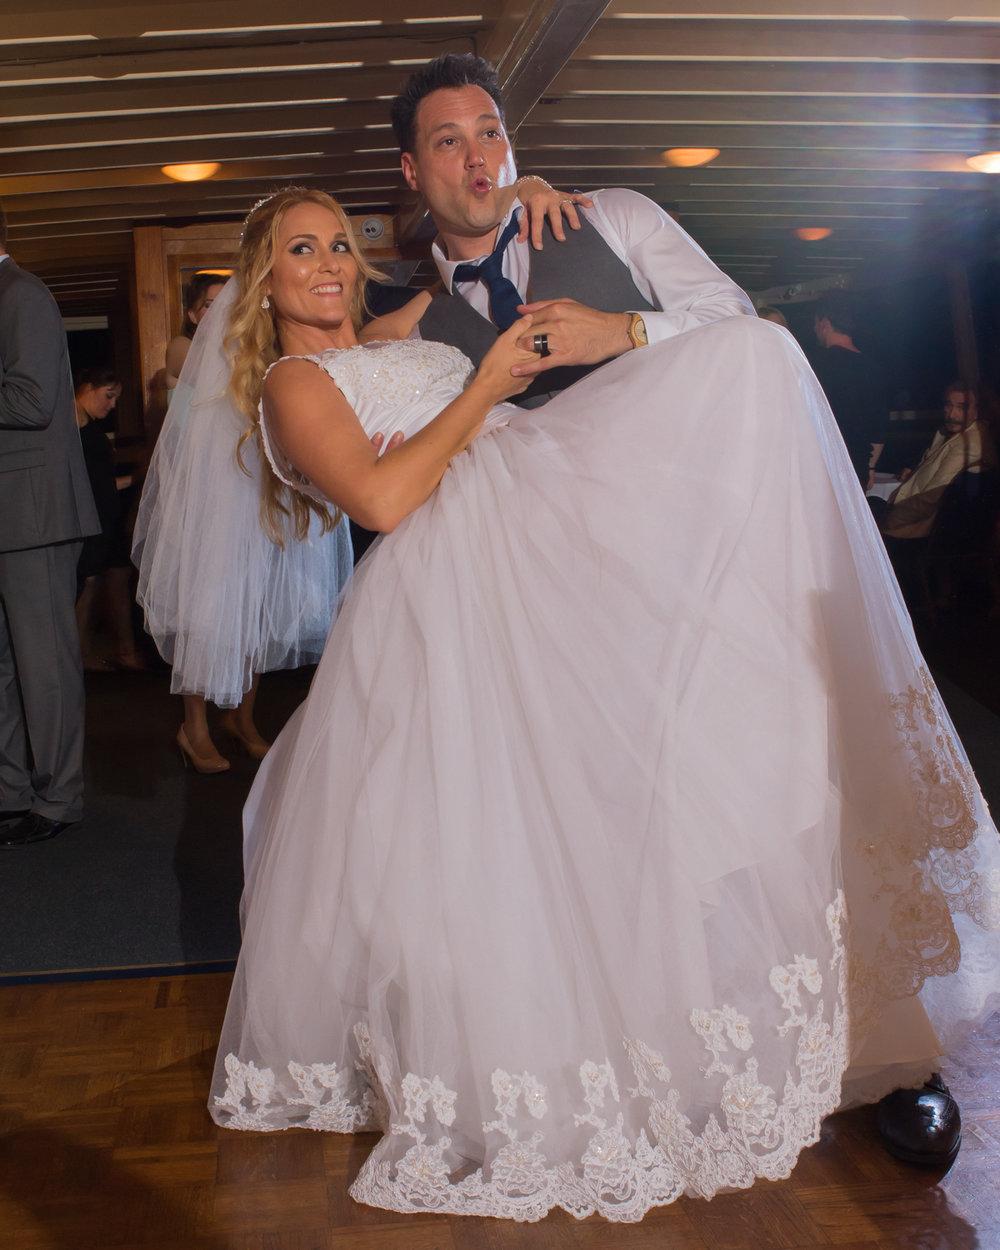 2016_September_04-nomad_lola_wedding_secondshooter-28006.jpg